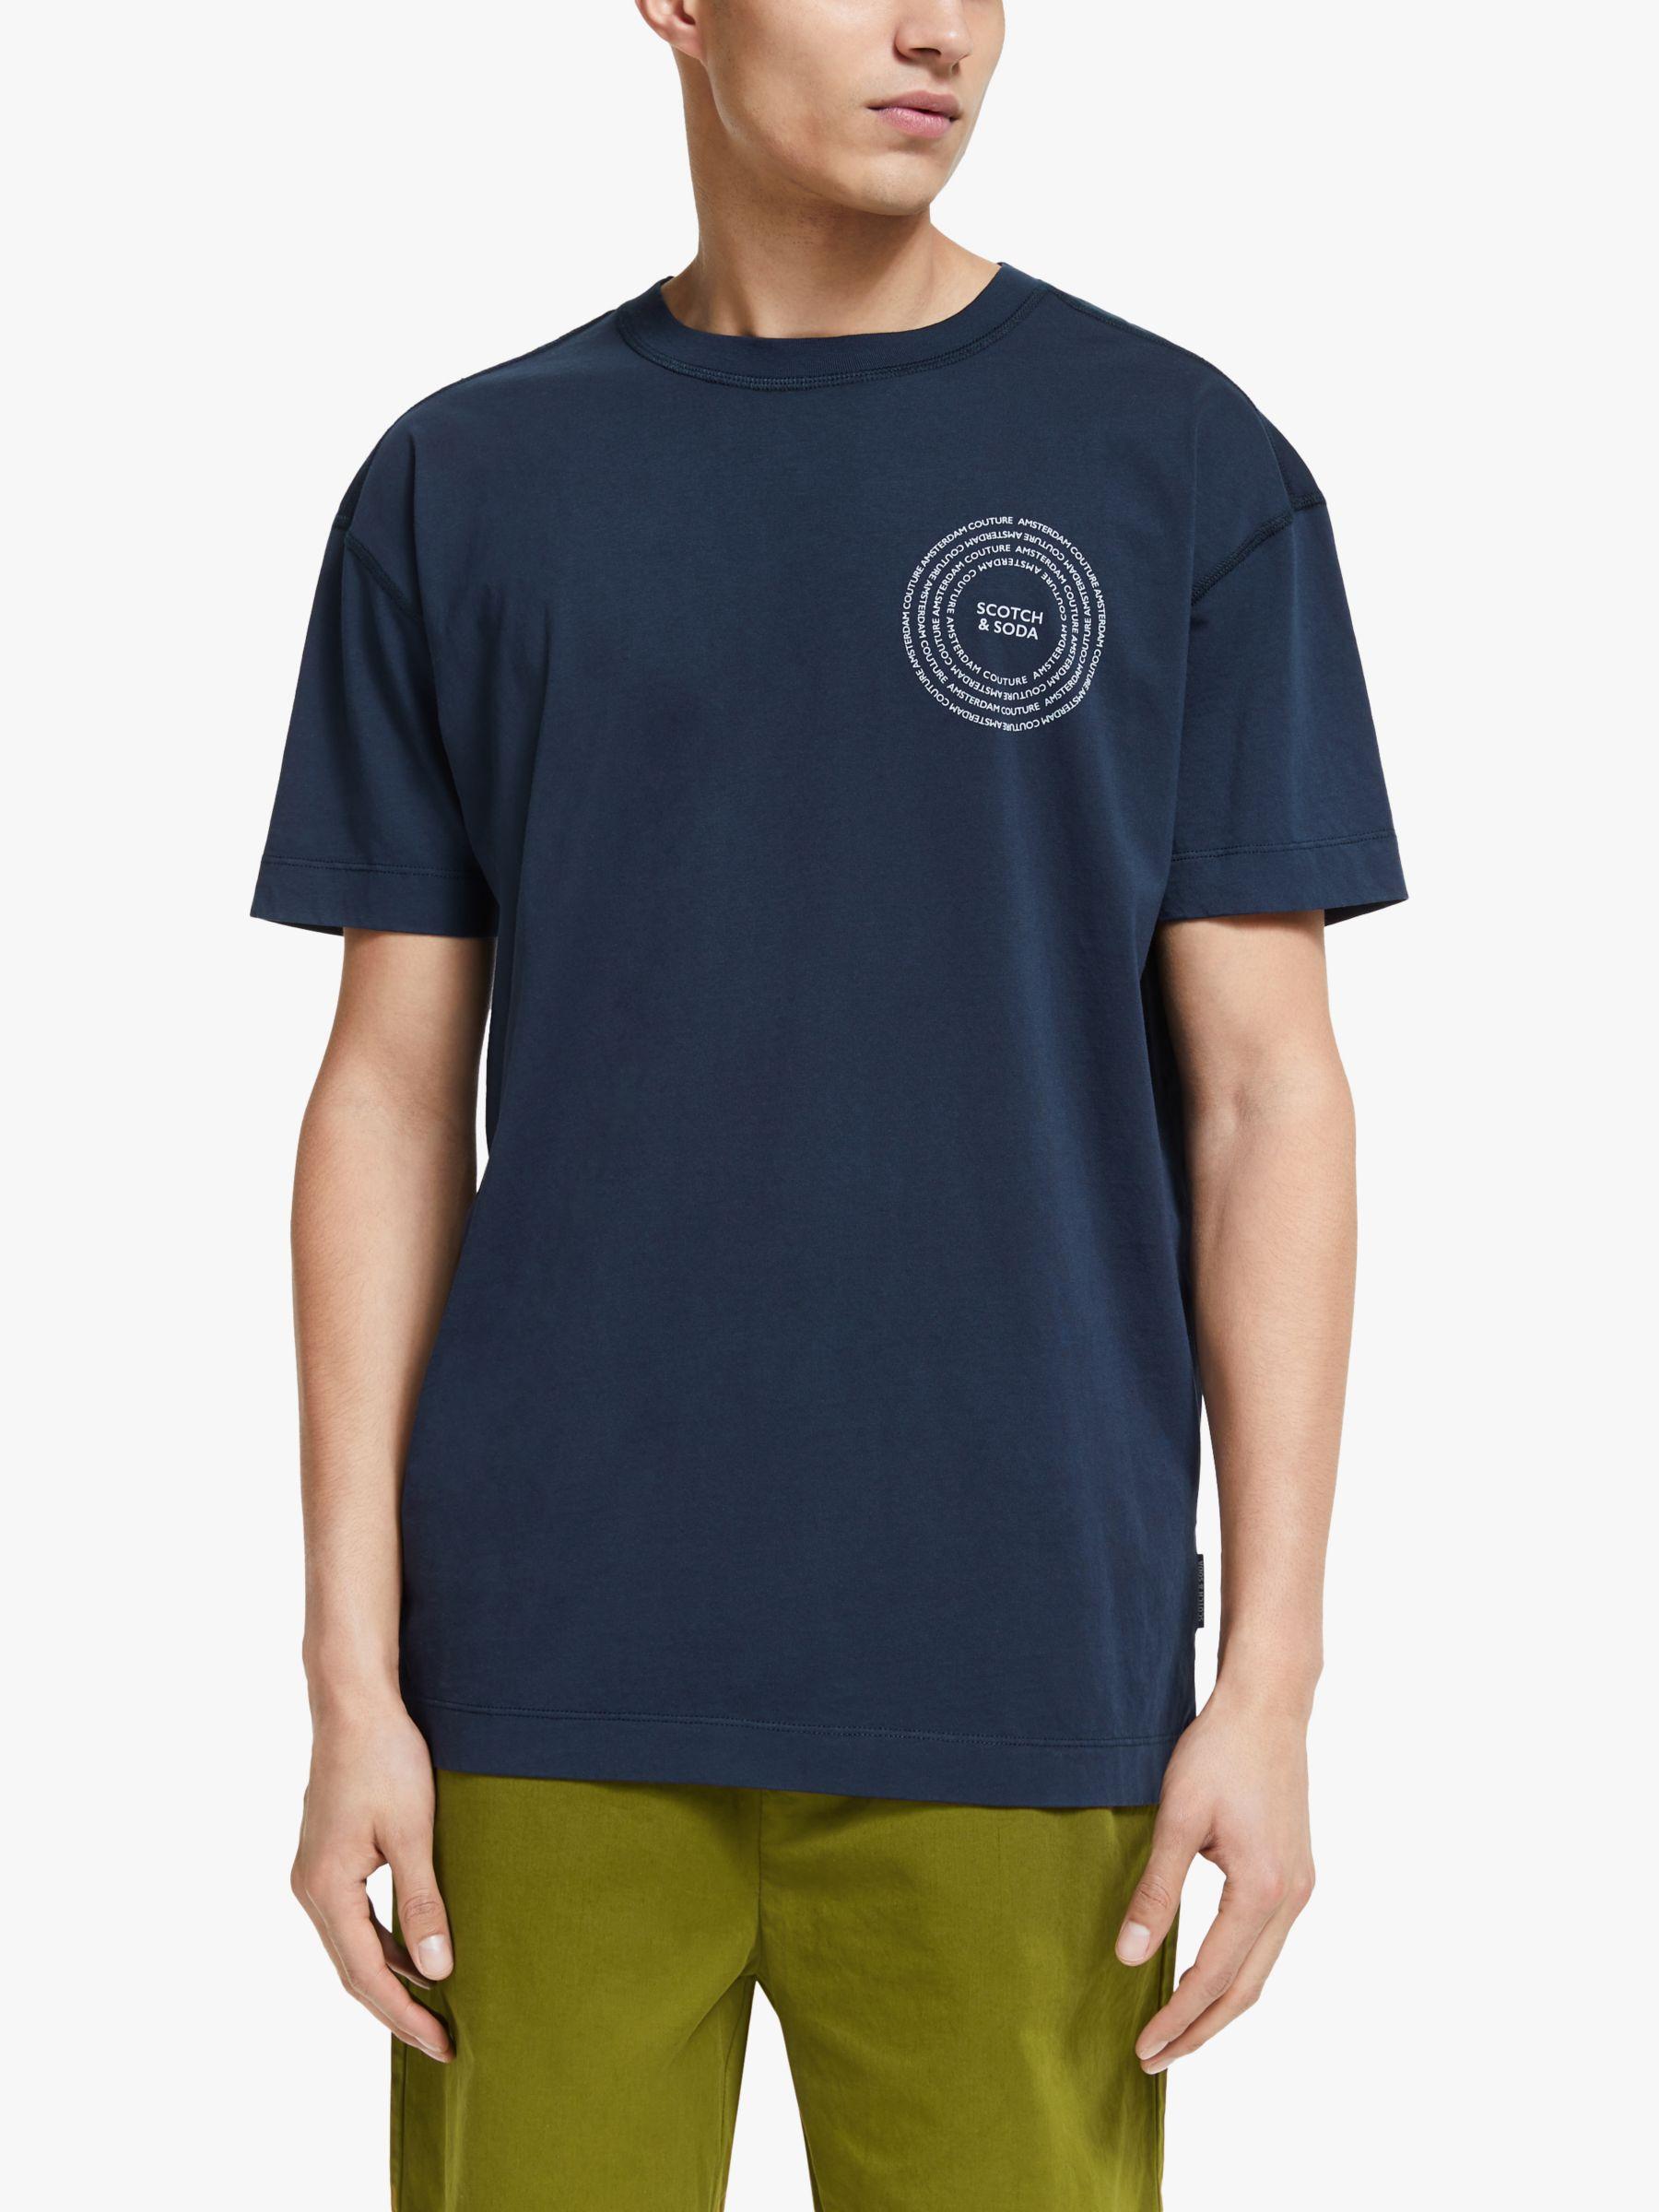 Scotch & Soda Scotch & Soda Clean Logo Organic Cotton T-Shirt, Night